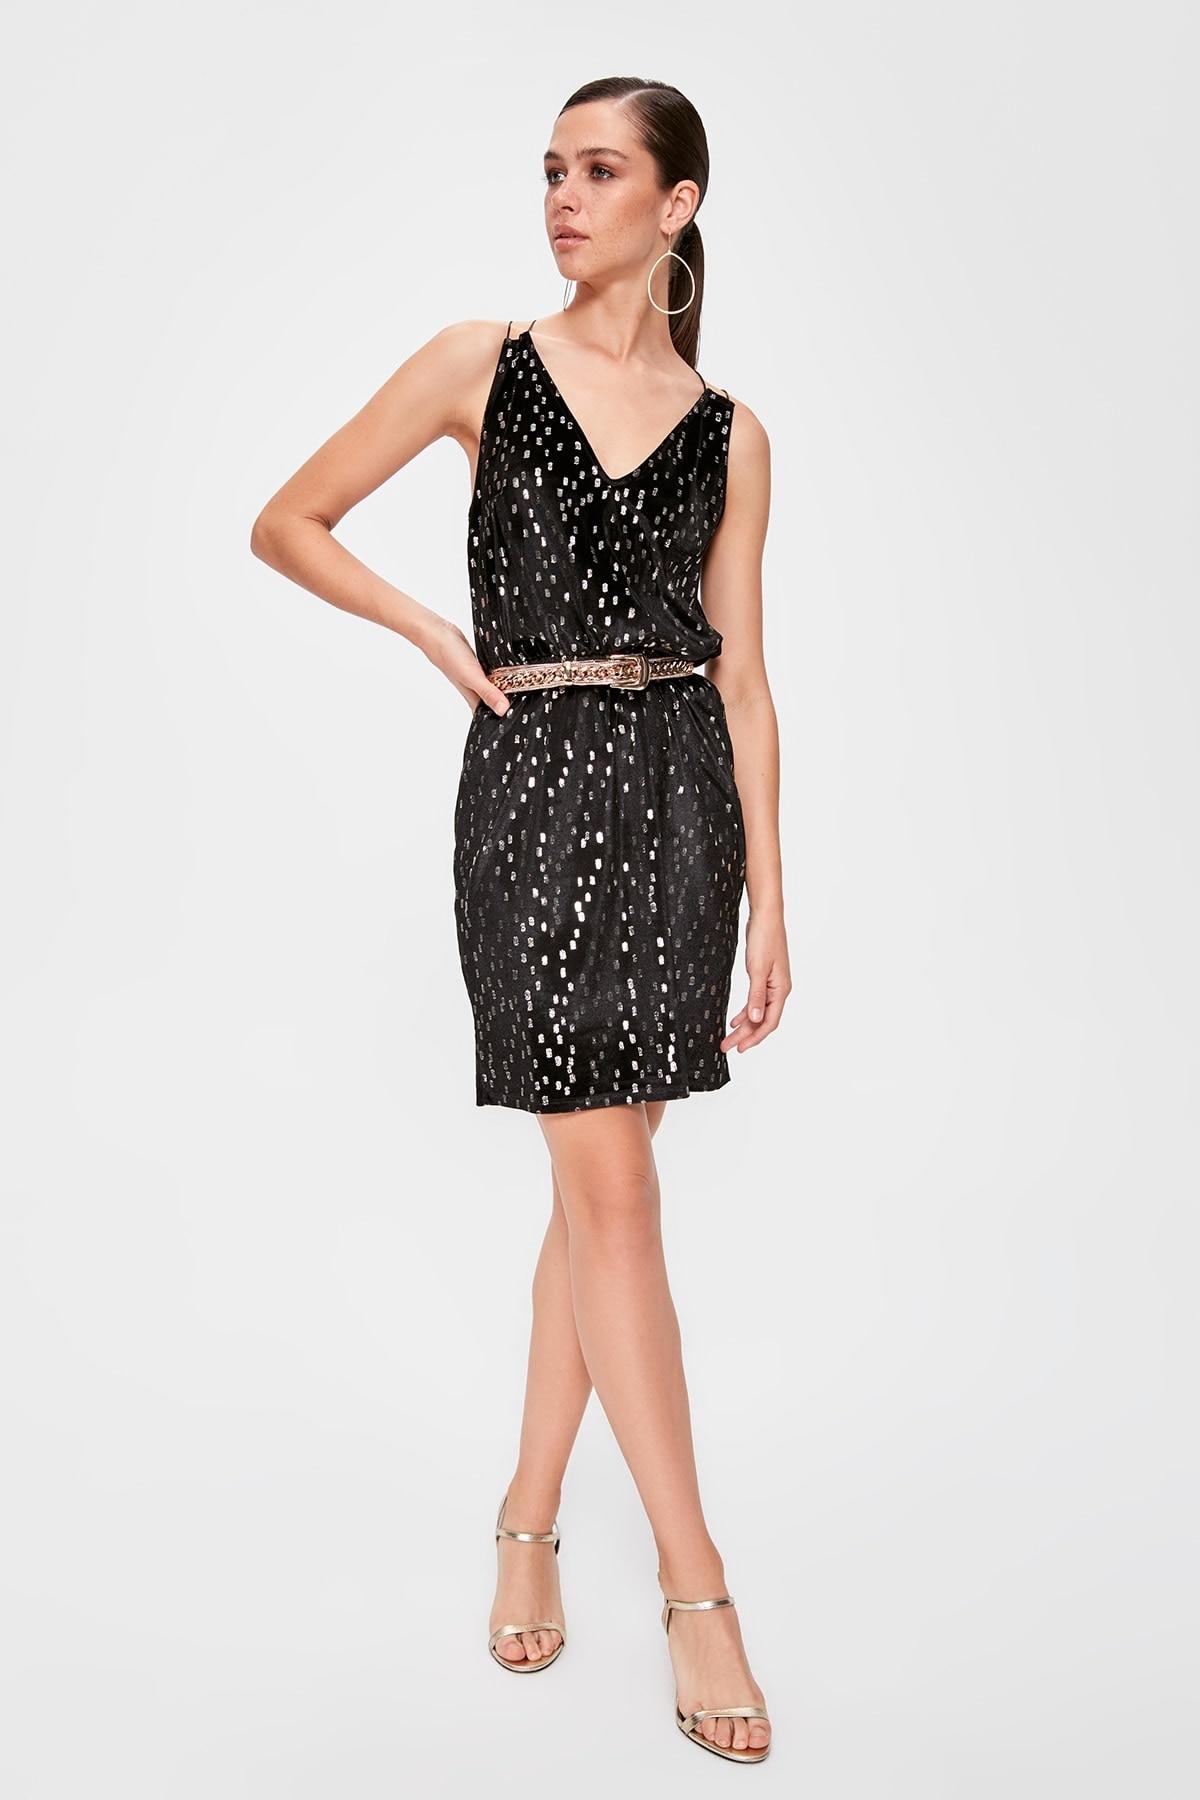 Trendyol Patterned Dress TPRAW20EL1569